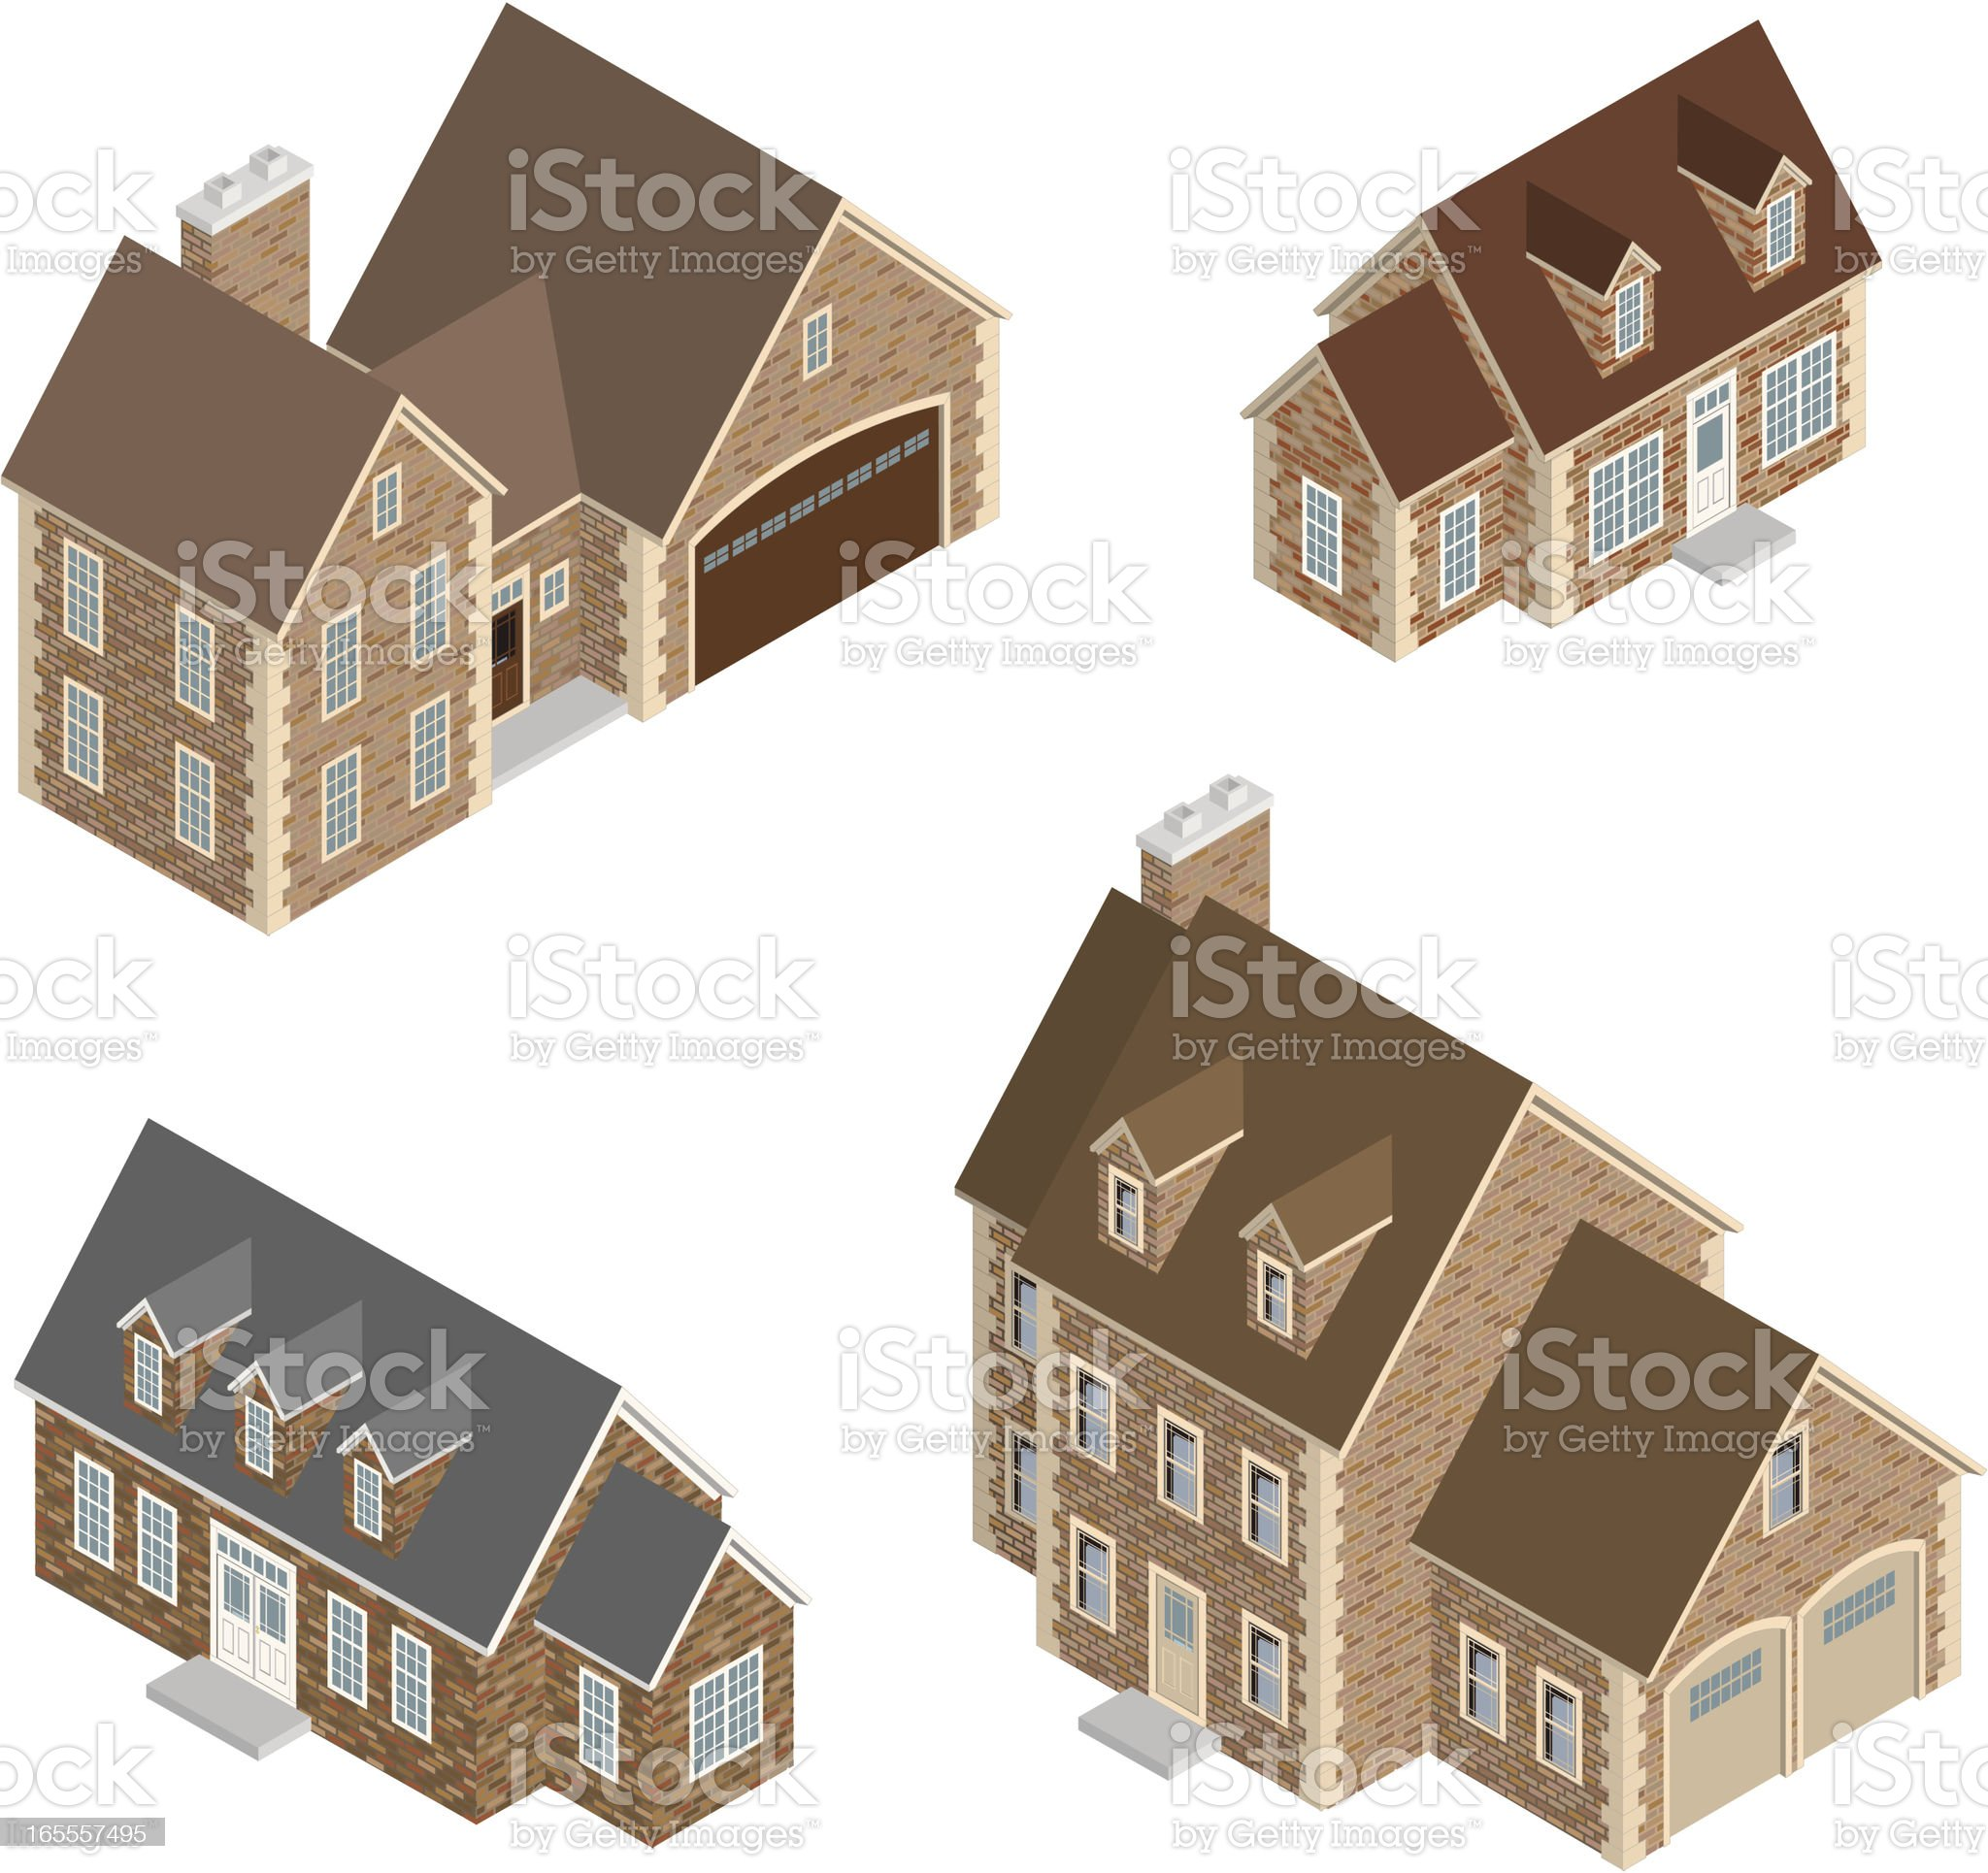 Vector Isometric Brick Houses royalty-free stock vector art